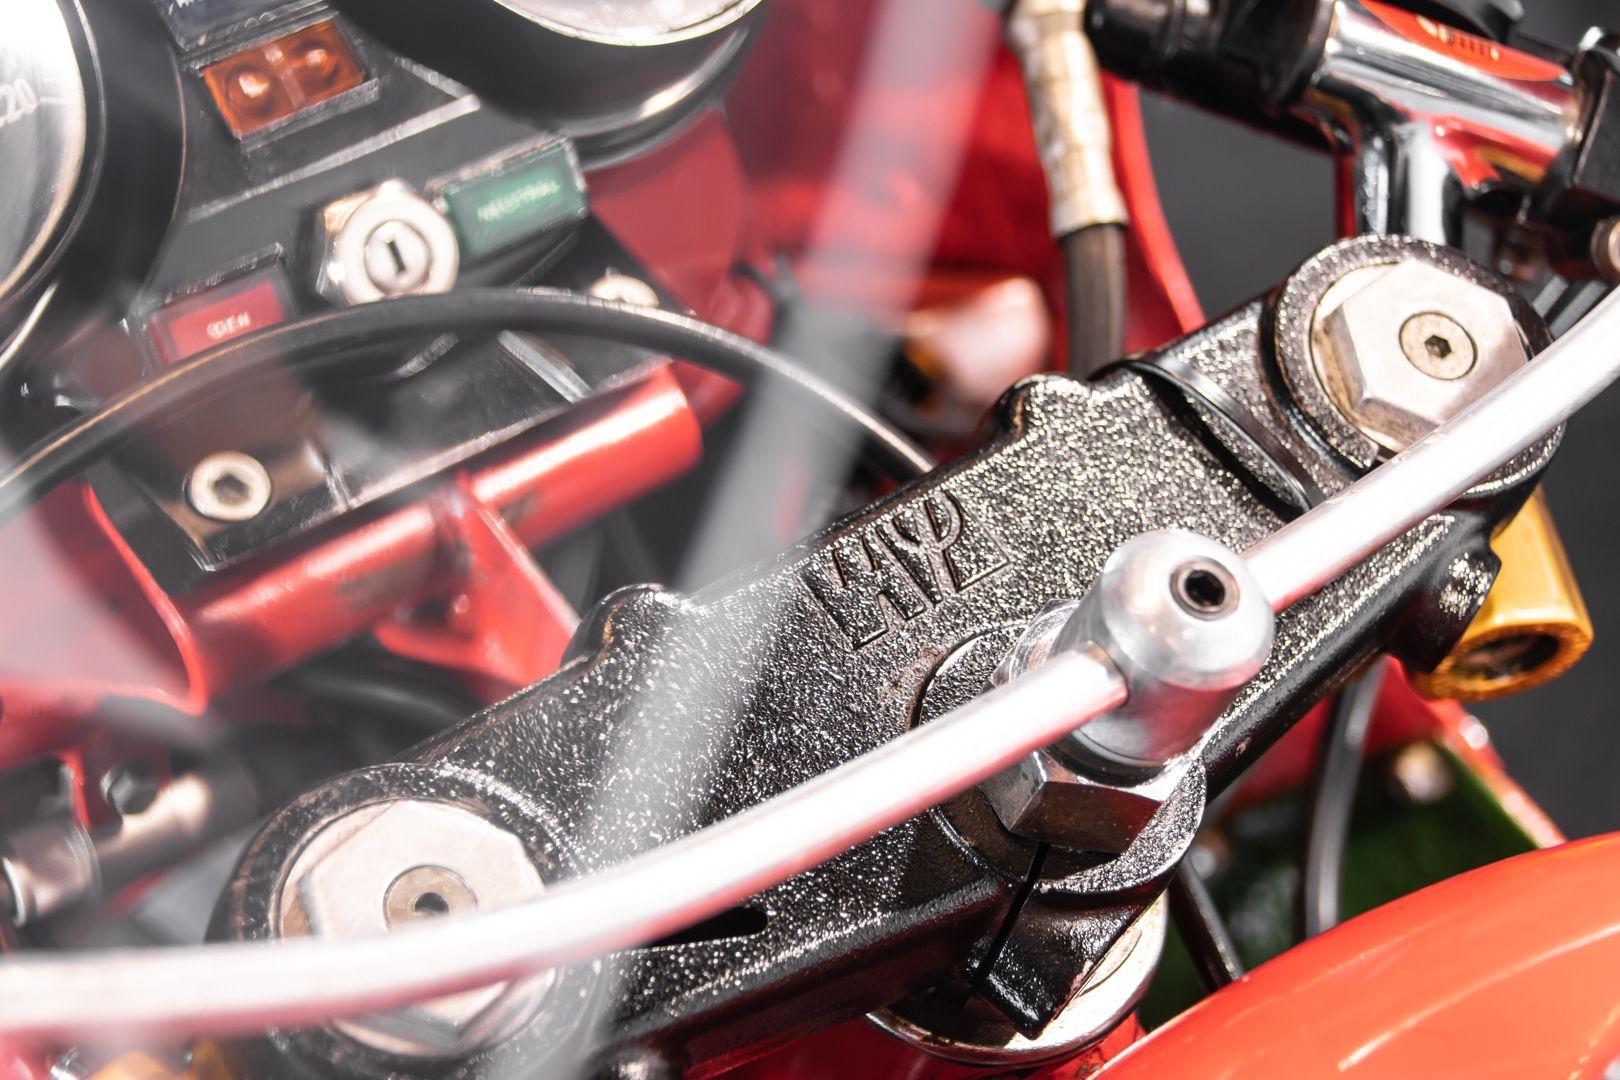 1983 Ducati 900 Mike Hailwood Replica 71433